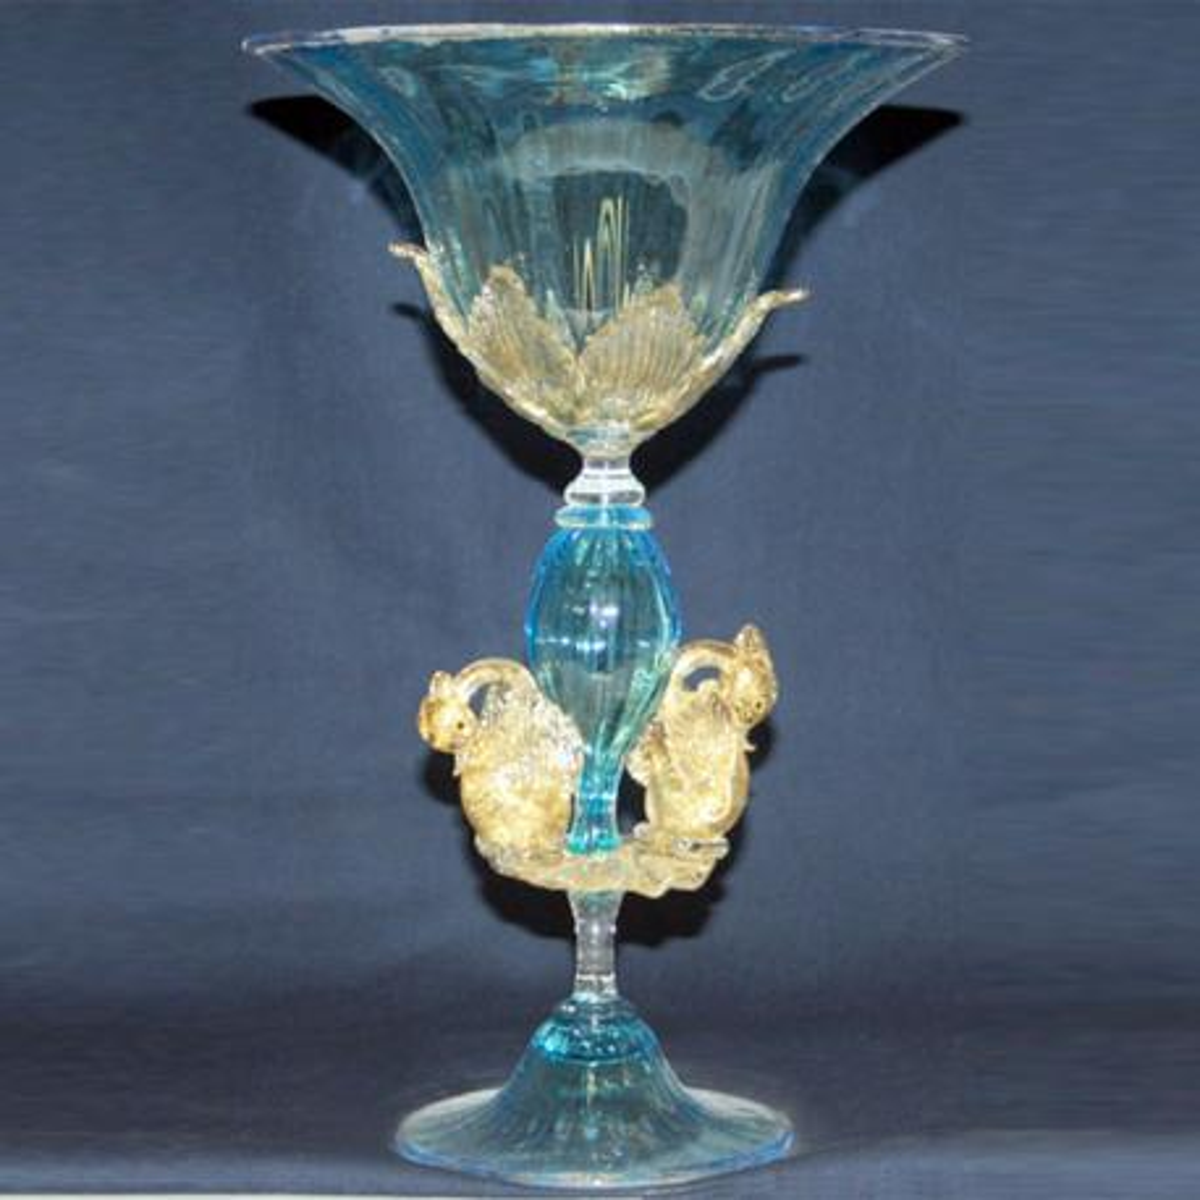 """Coppa del Re"" verre en cristal de Murano - bleu"